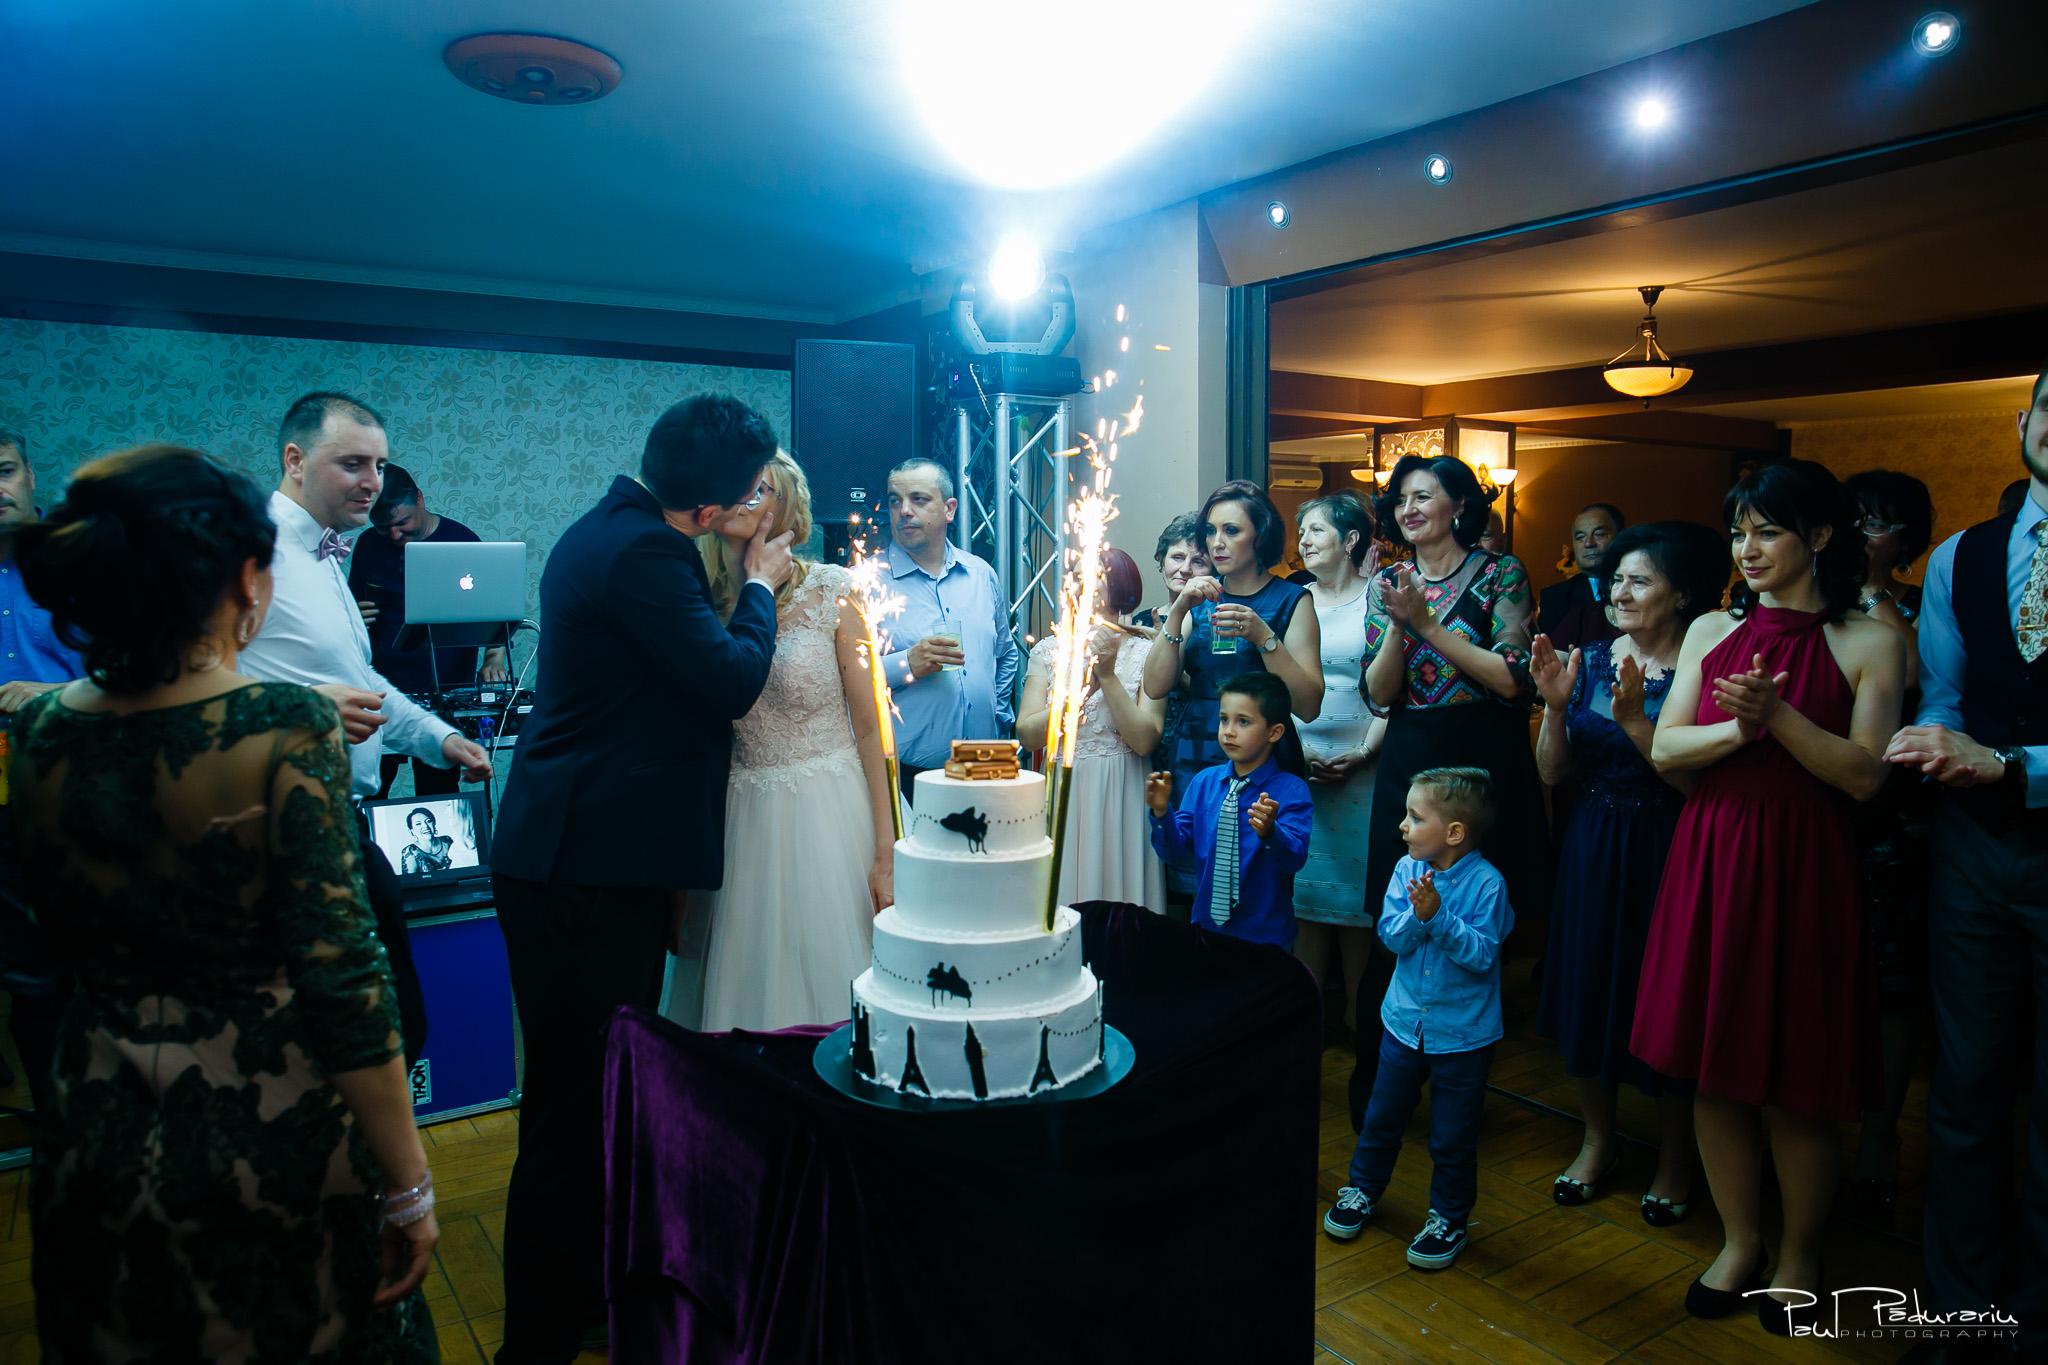 Anca si Razvan petrecere restaurant American Iasi - Paul Padurariu fotograf profesionist nunta iasi www.paulpadurariu.ro © 2018 Paul Padurariu tort miri